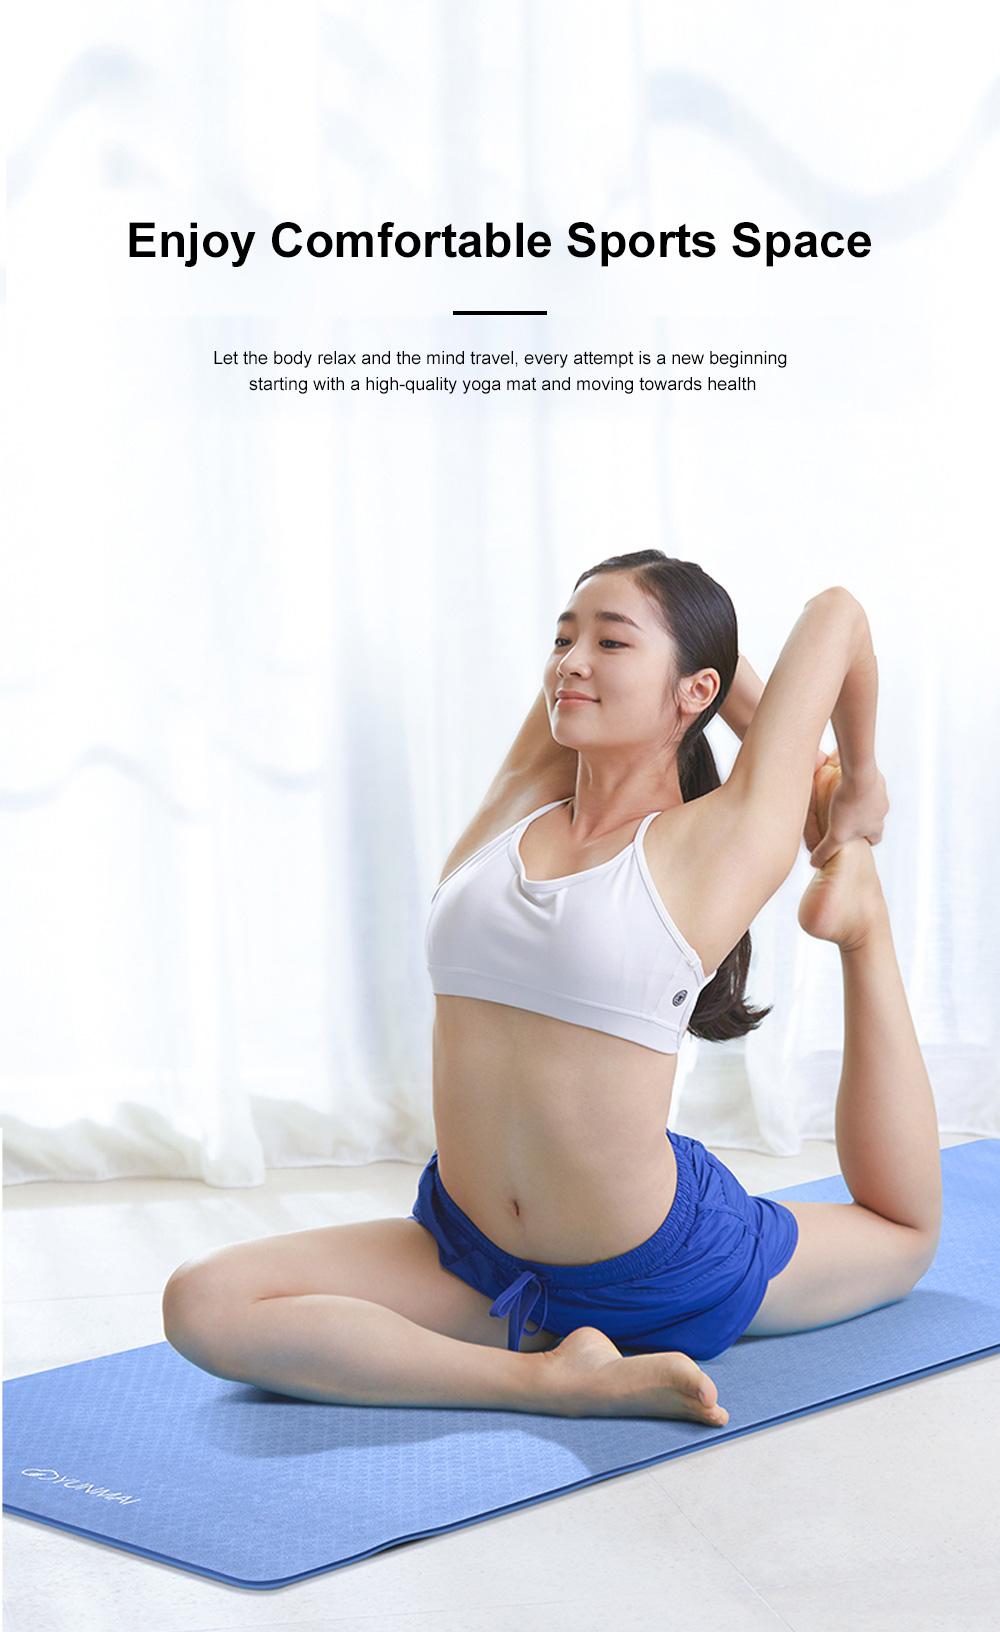 Yunmai Sport Yoga Mat Eco Friendly Durable Yoga Mat Thick Fitness Foldable Travel Exercise Non Slip Yoga Blanket 4